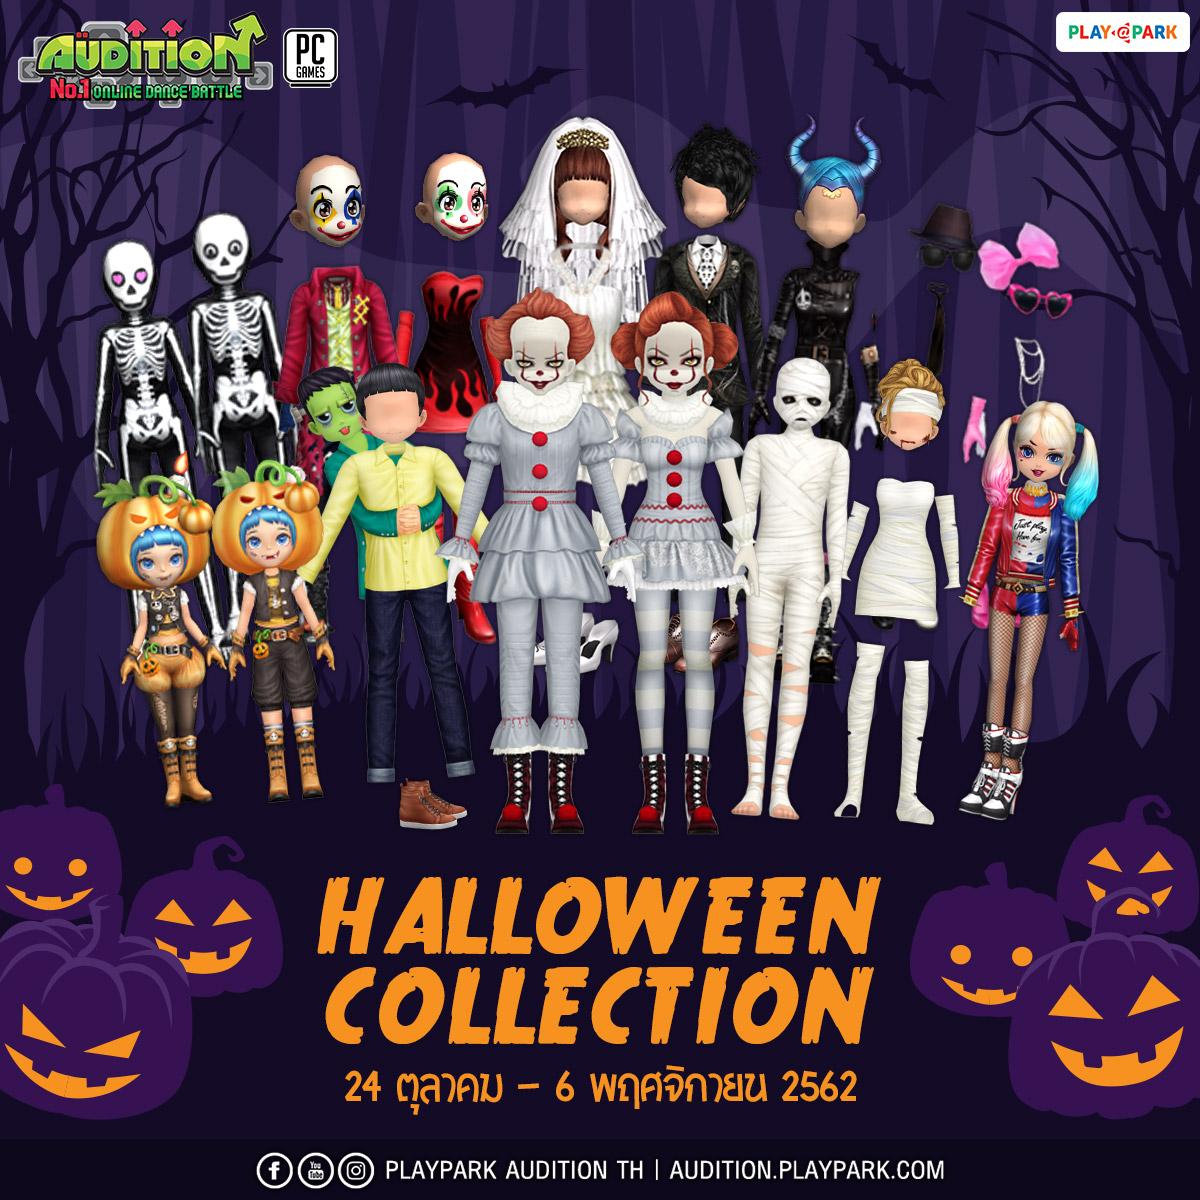 [AUDITION] 24 ตุลาคมนี้ อัปเดตไอเทมและเปลี่ยนฉากในเกม ต้อนรับเทศกาล Halloween ห้ามพลาด !!!